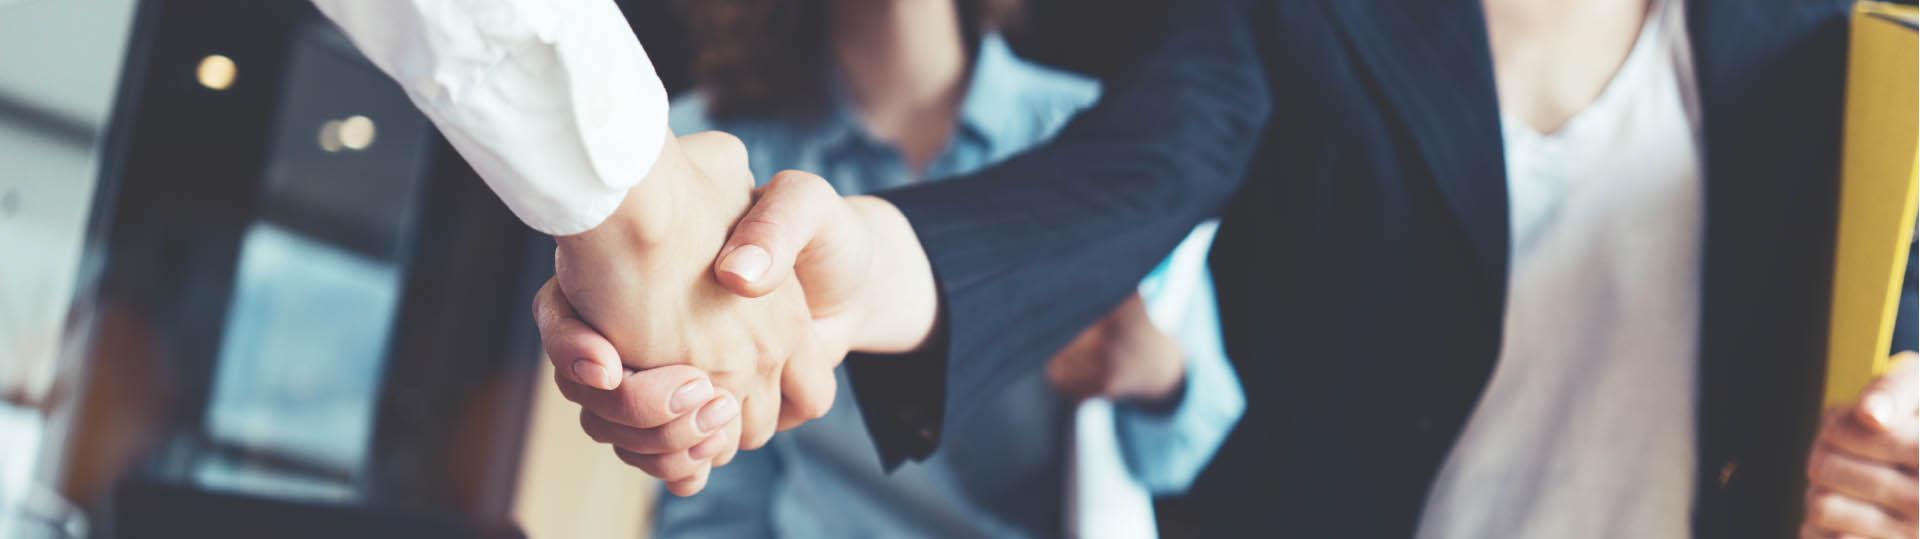 Implico-Partner-Program-Handshake